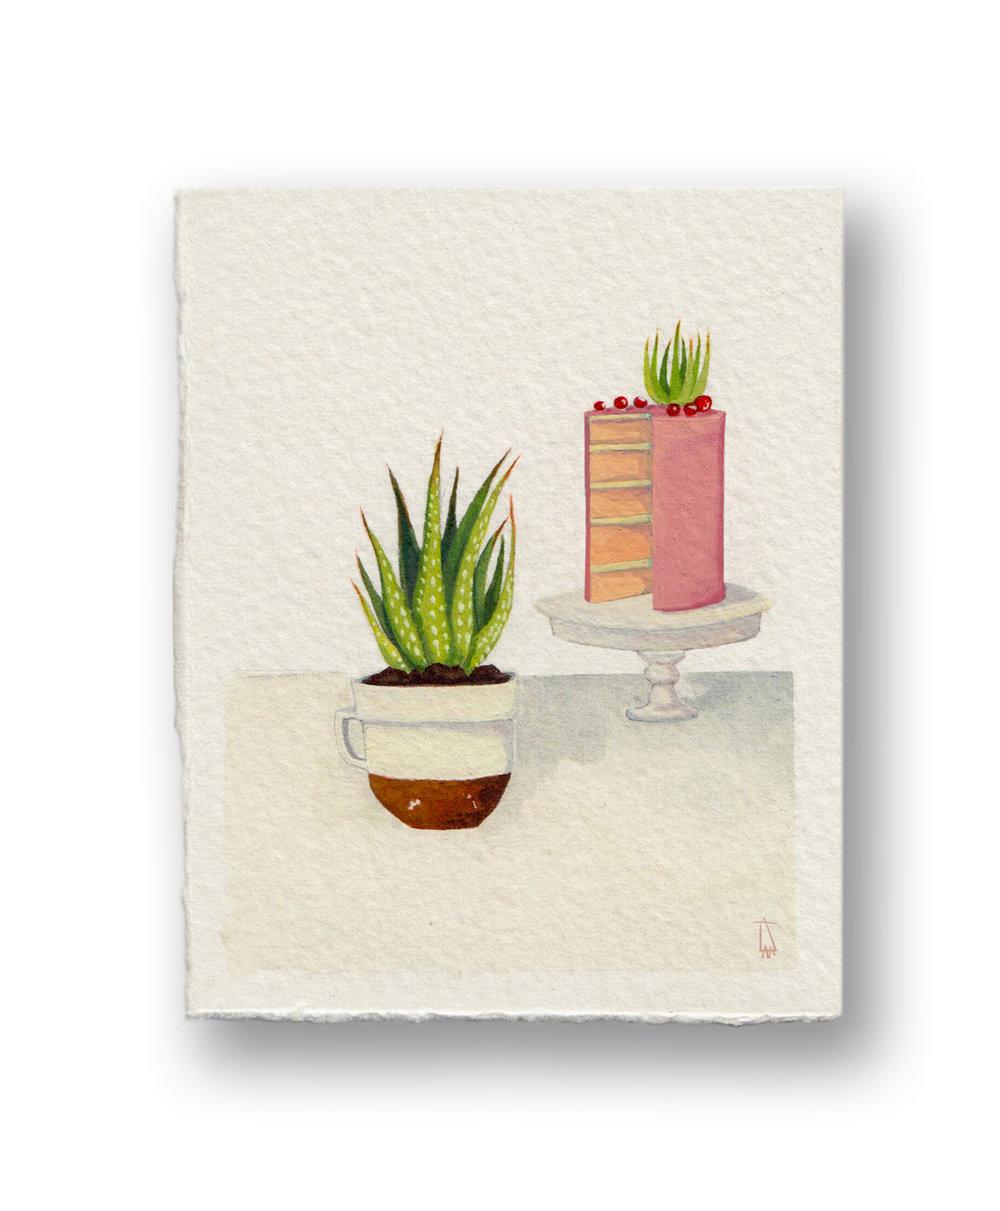 "Succulent & Cake  Gouache 3 x 4"""